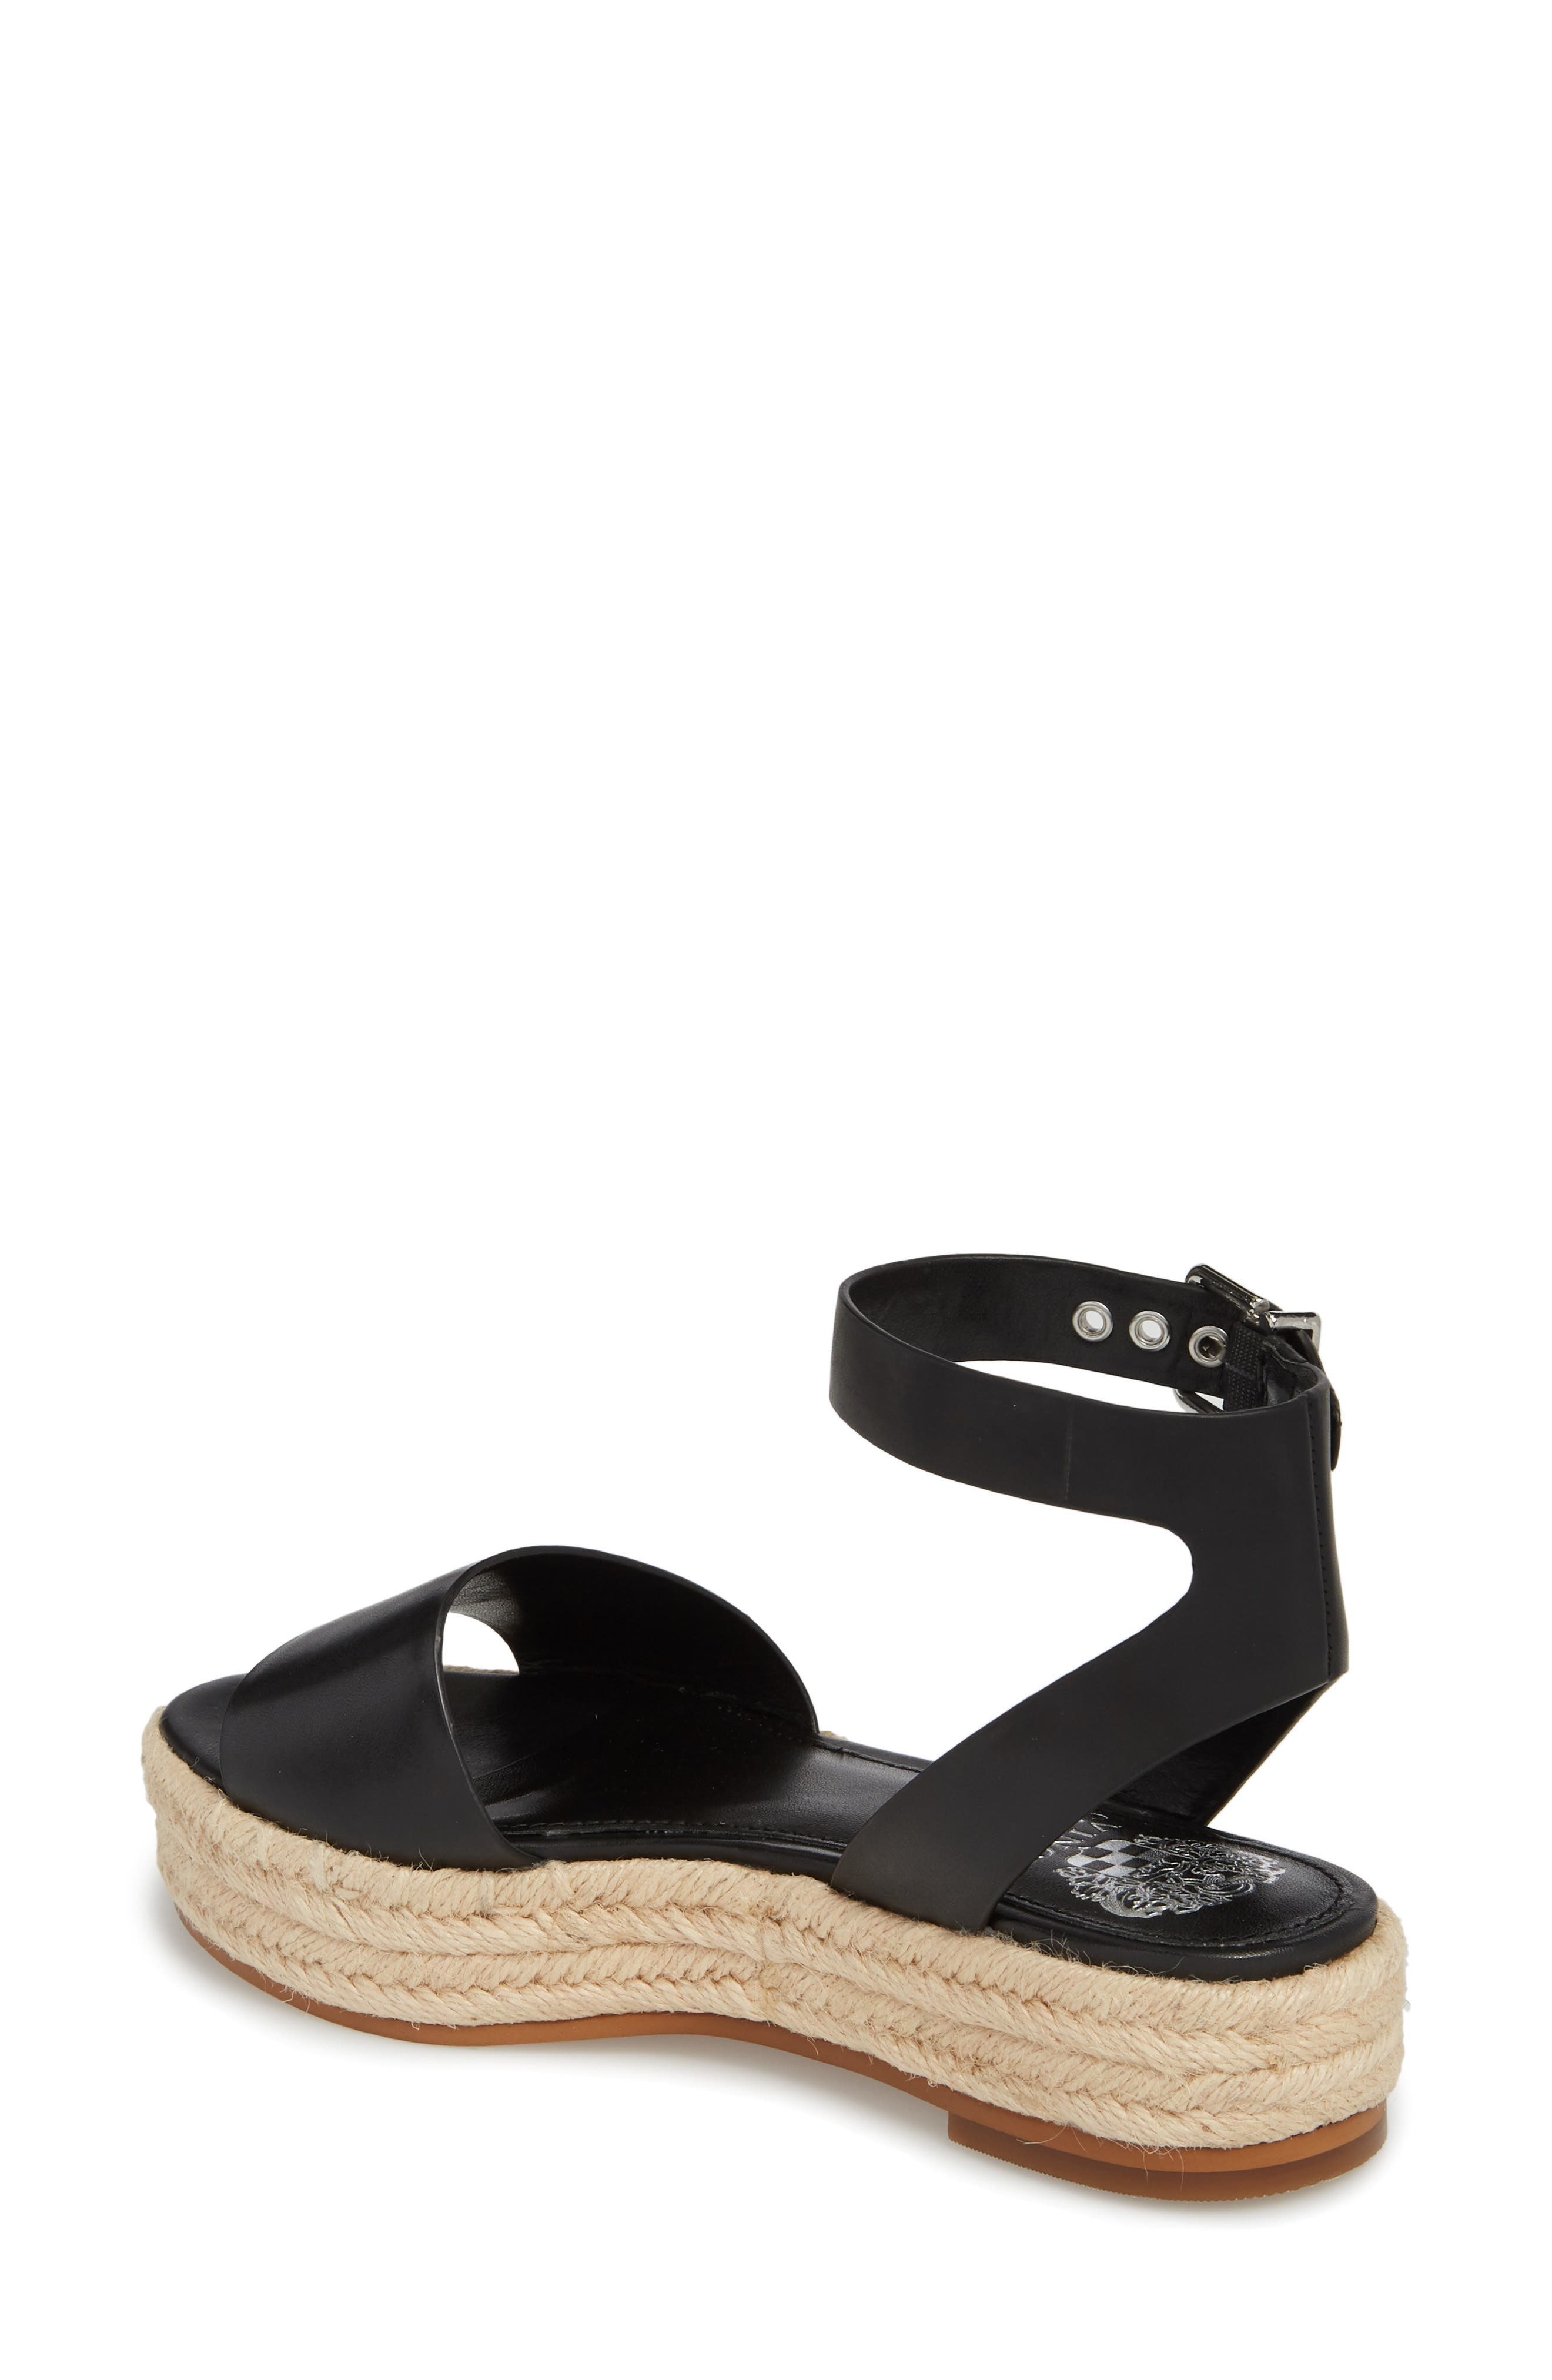 Kathalia Platform Sandal,                             Alternate thumbnail 2, color,                             001